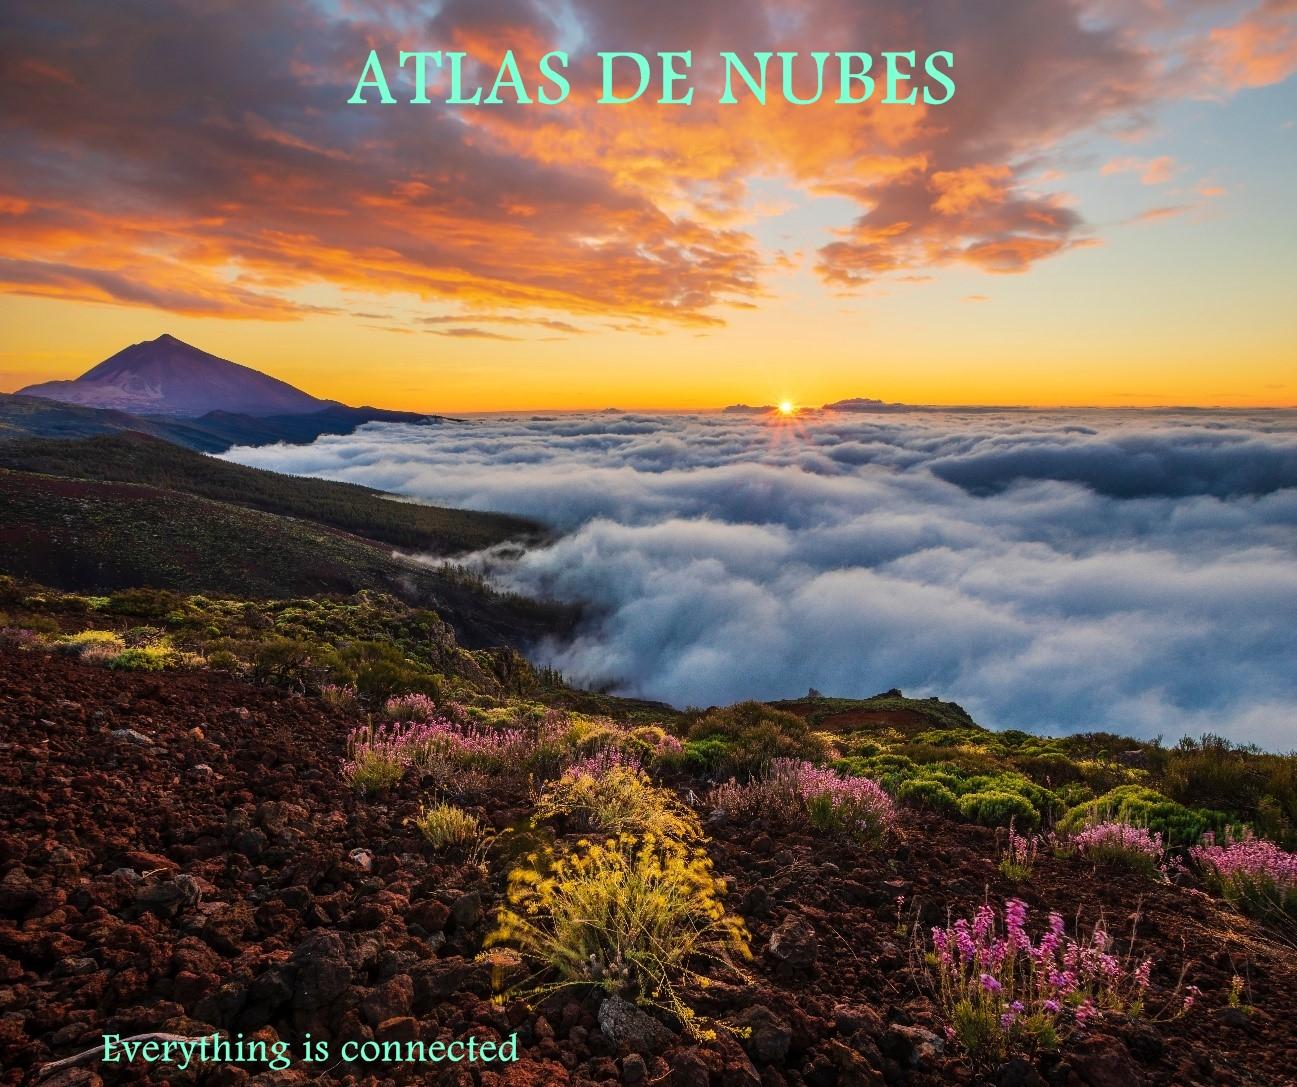 Atlas de nubes